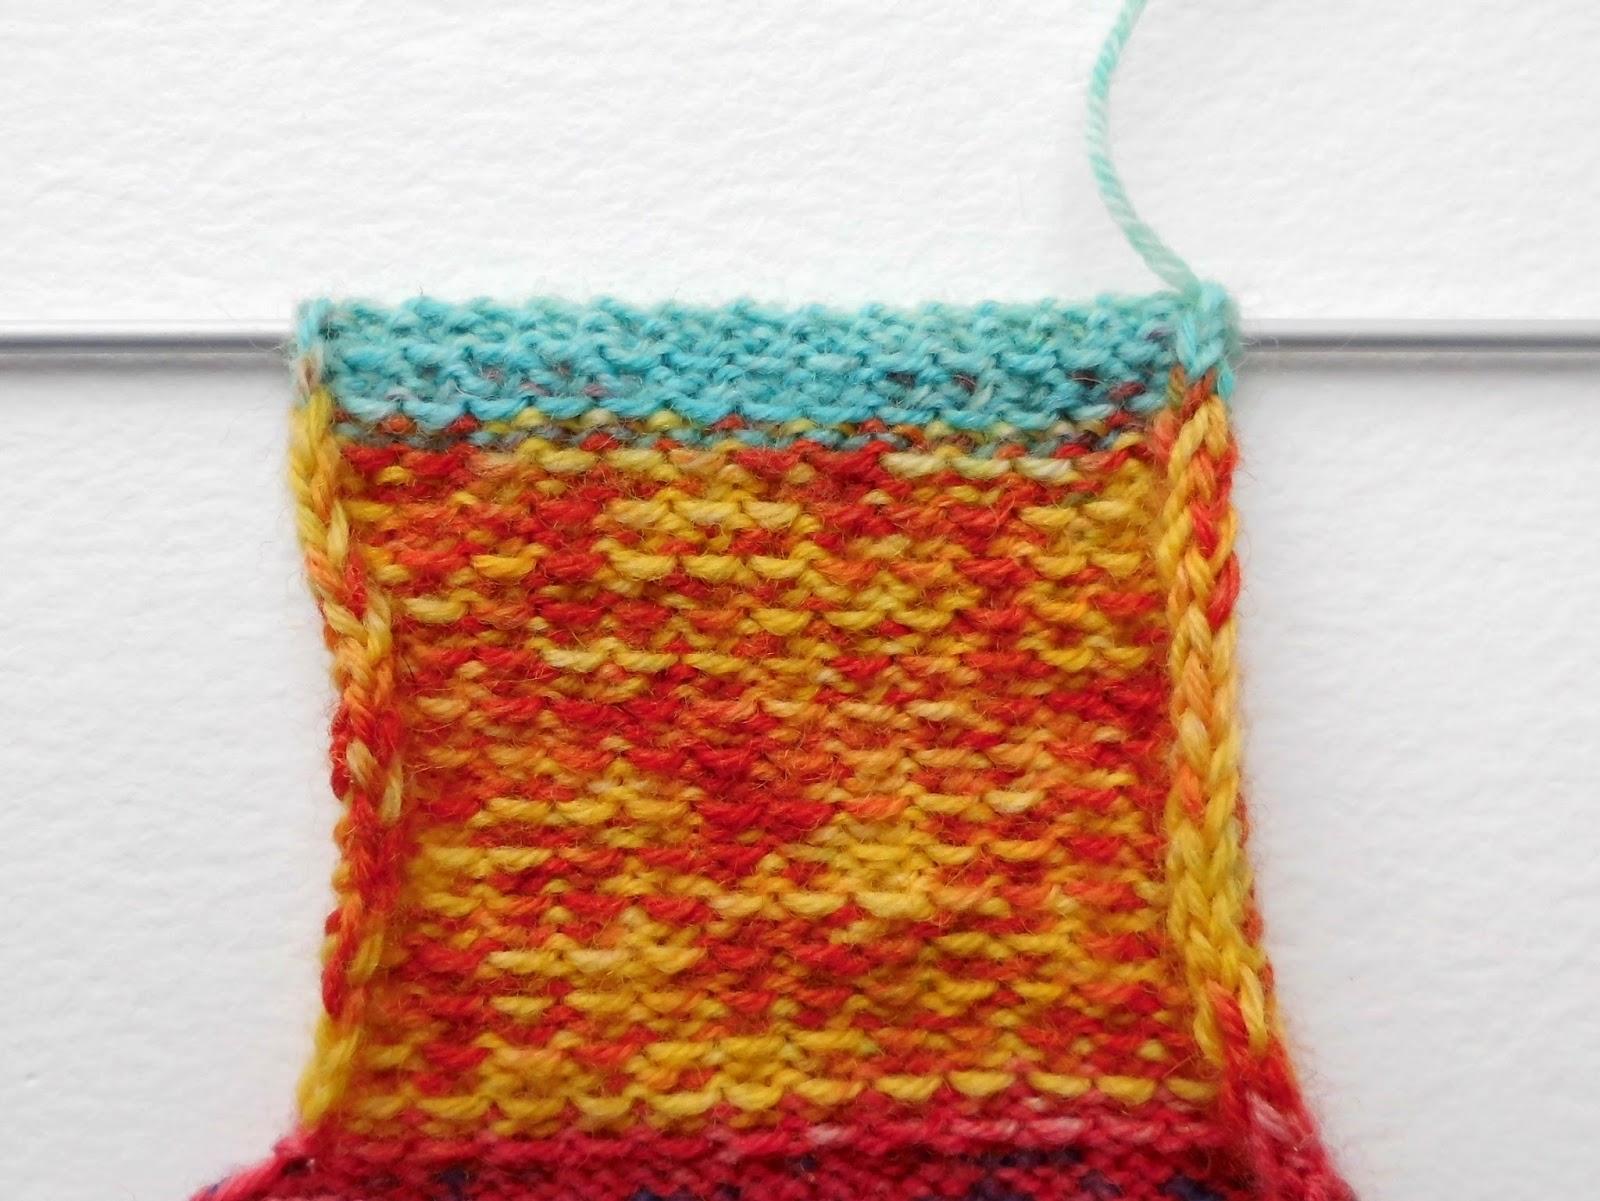 Sock knitting for beginners: heel flap wrong side